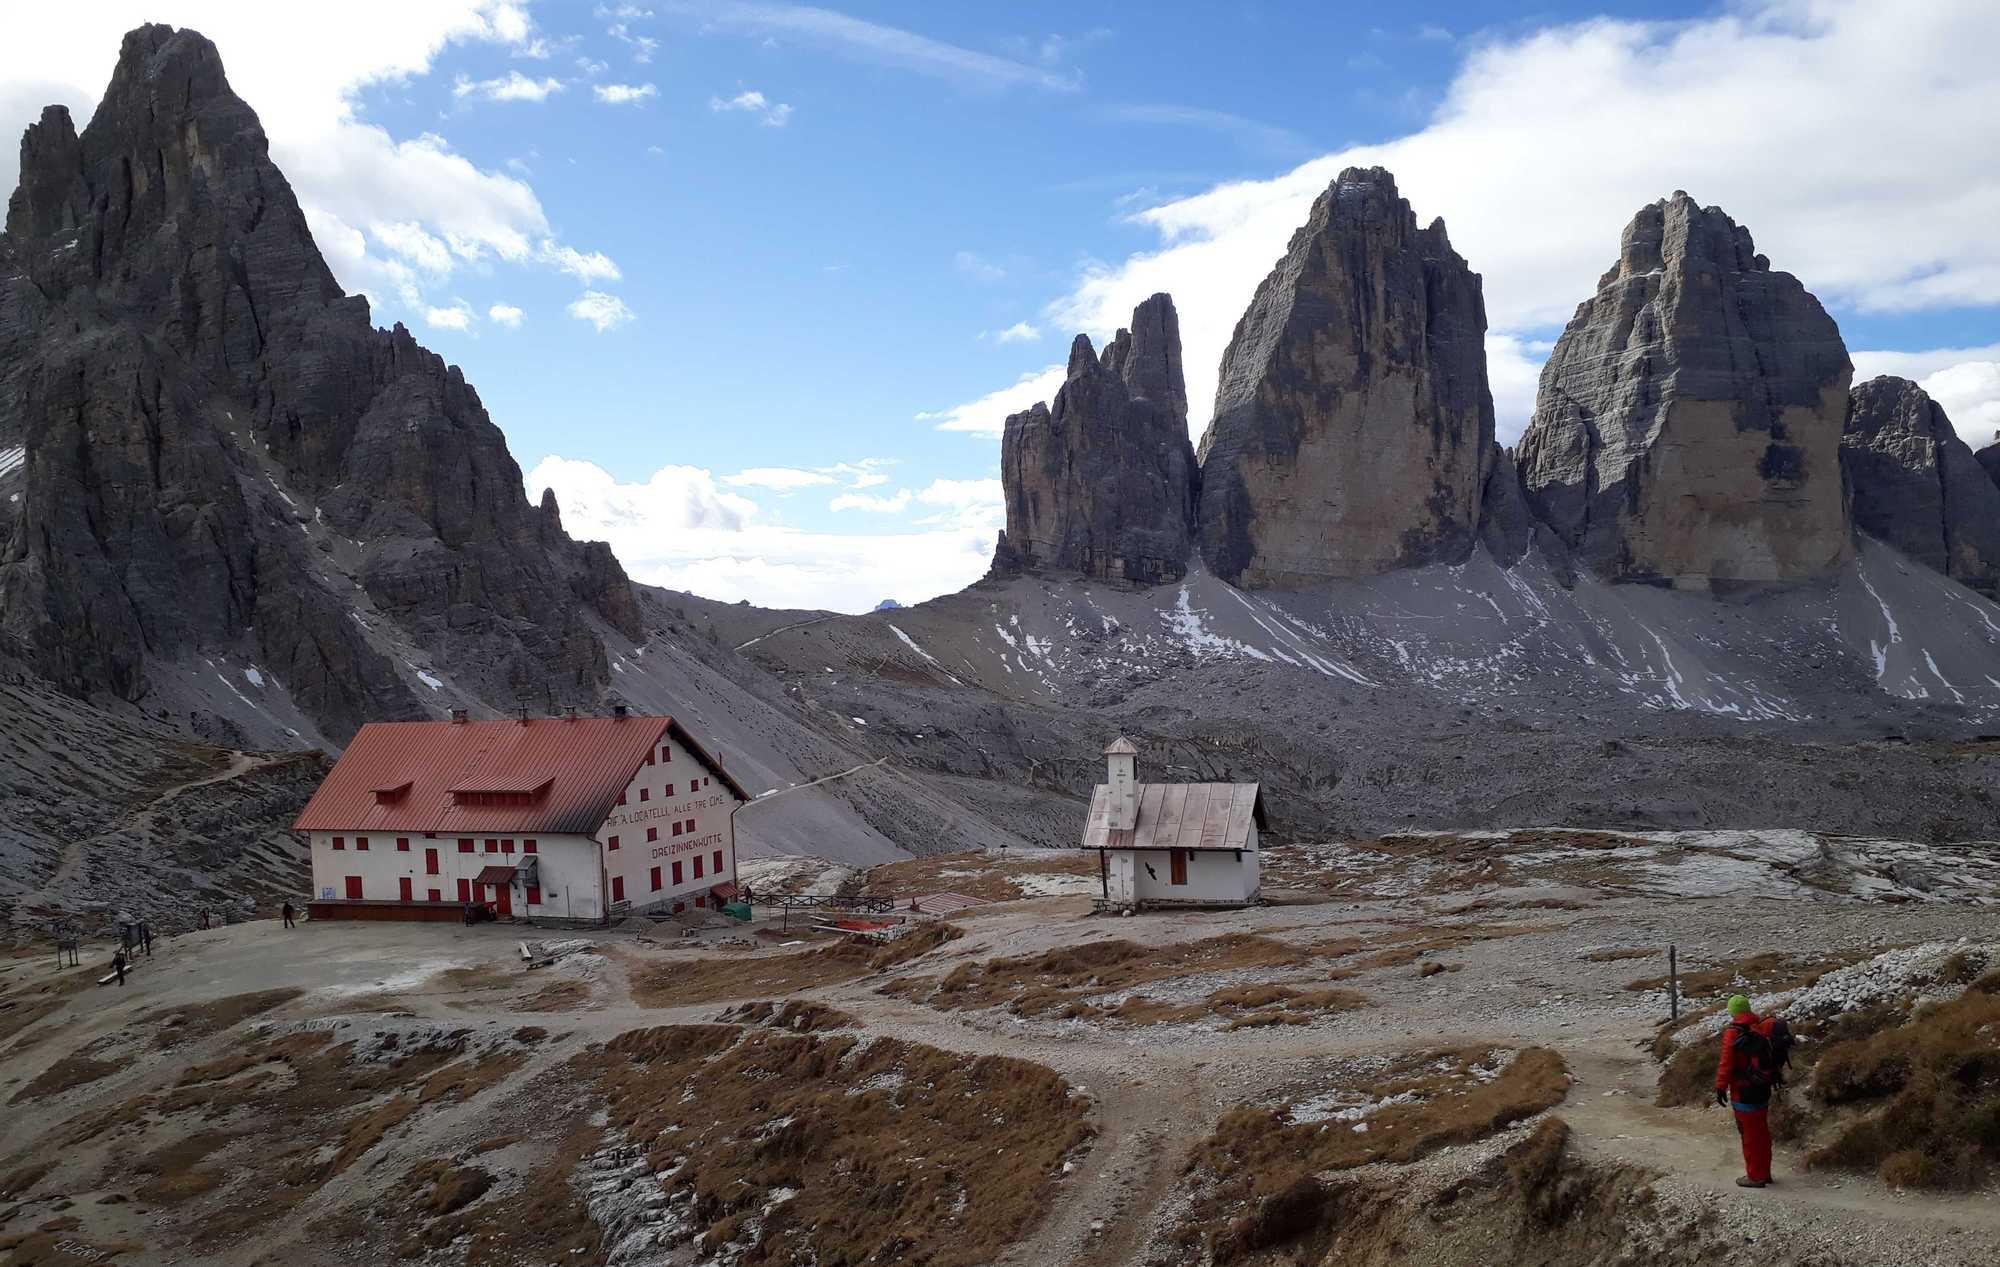 Vľavo Monte Paterno, chata Locatelli, Tre Cime